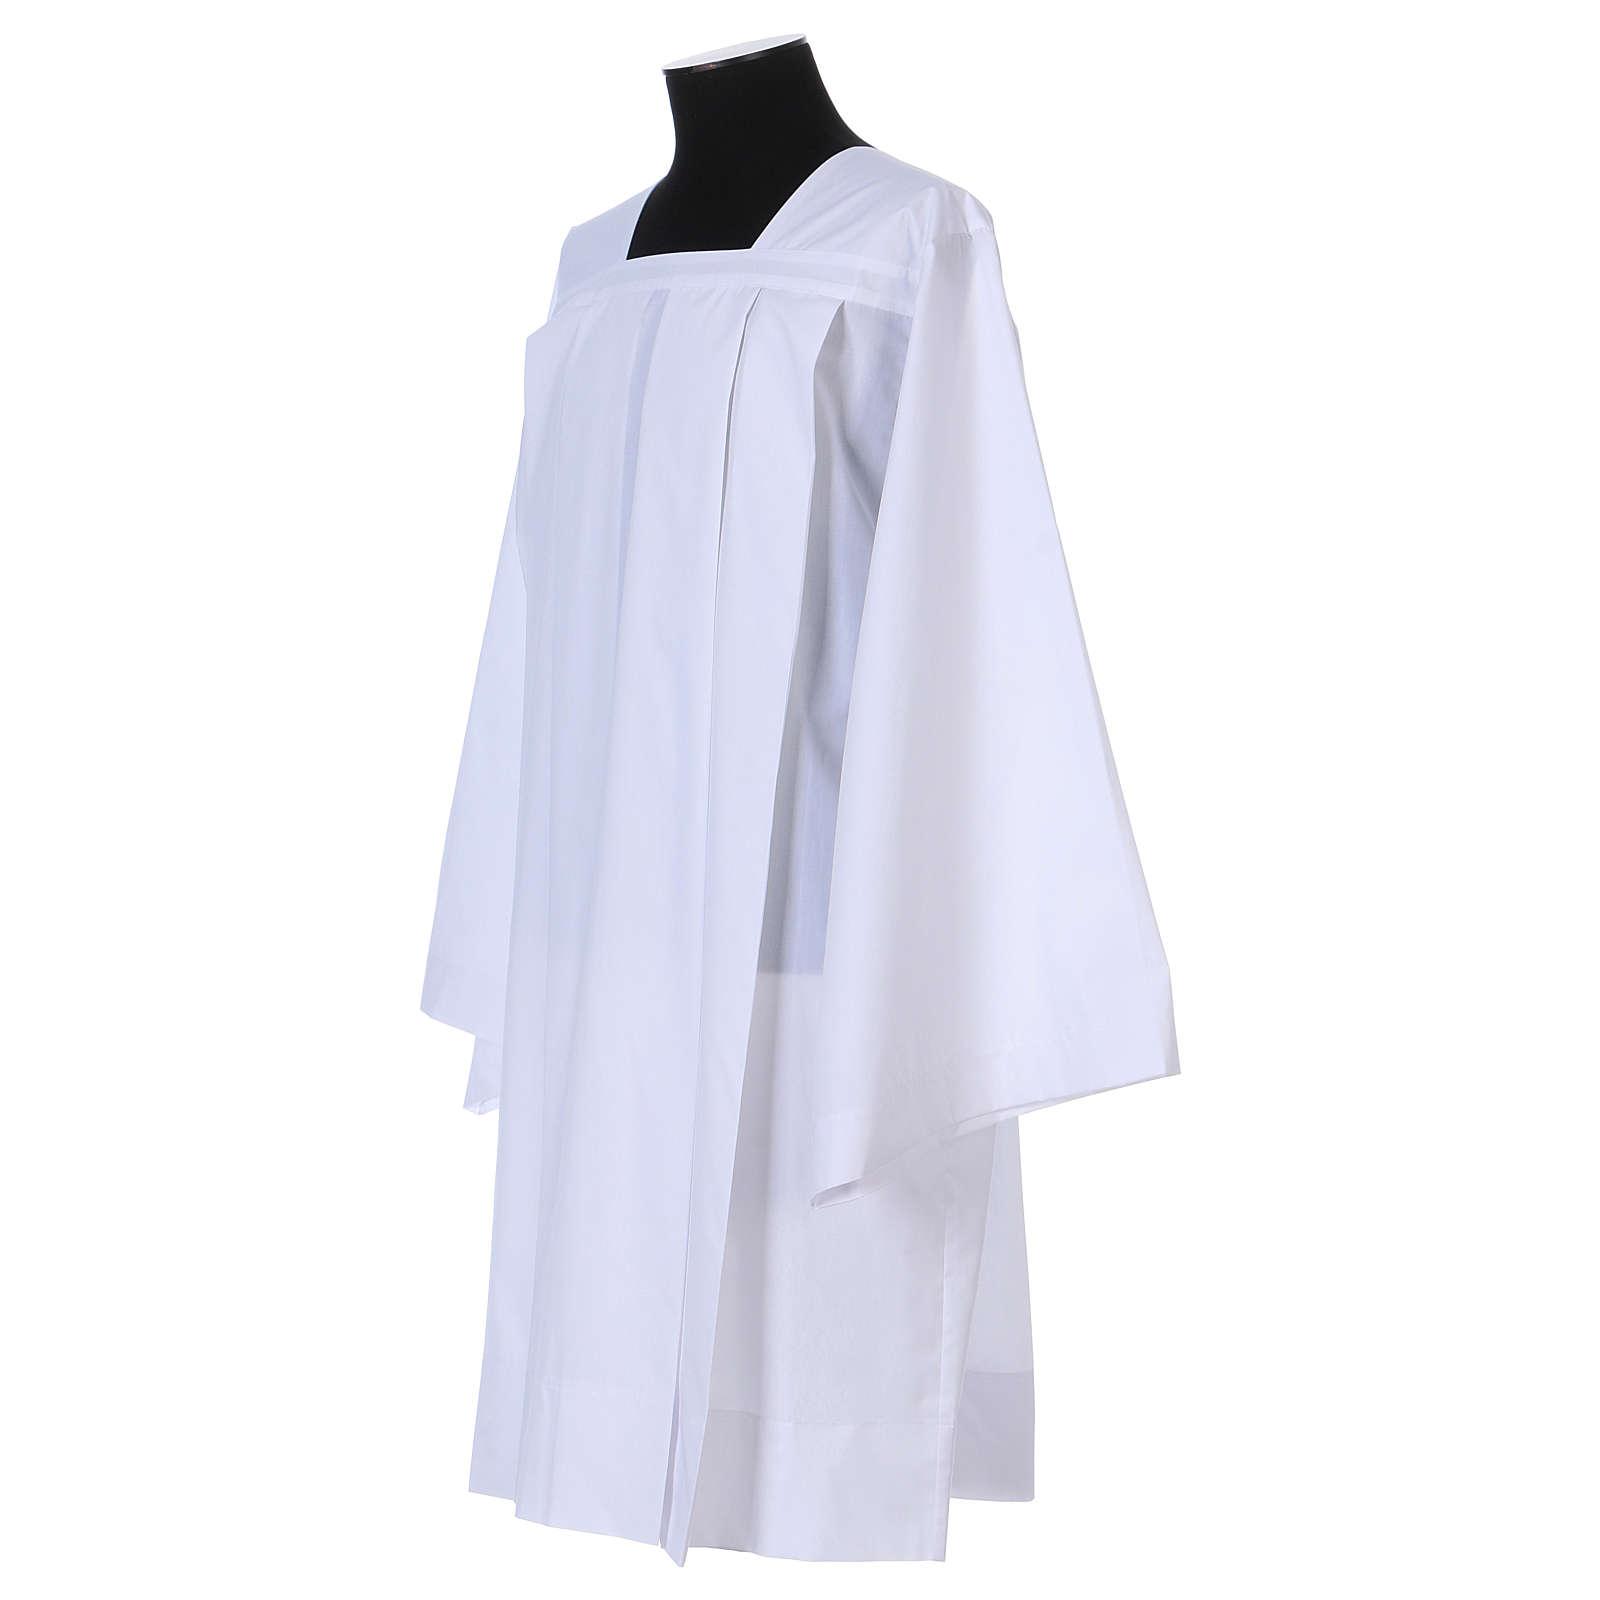 Surplice 65% polyester 35% cotton, 4 pleats, white 4